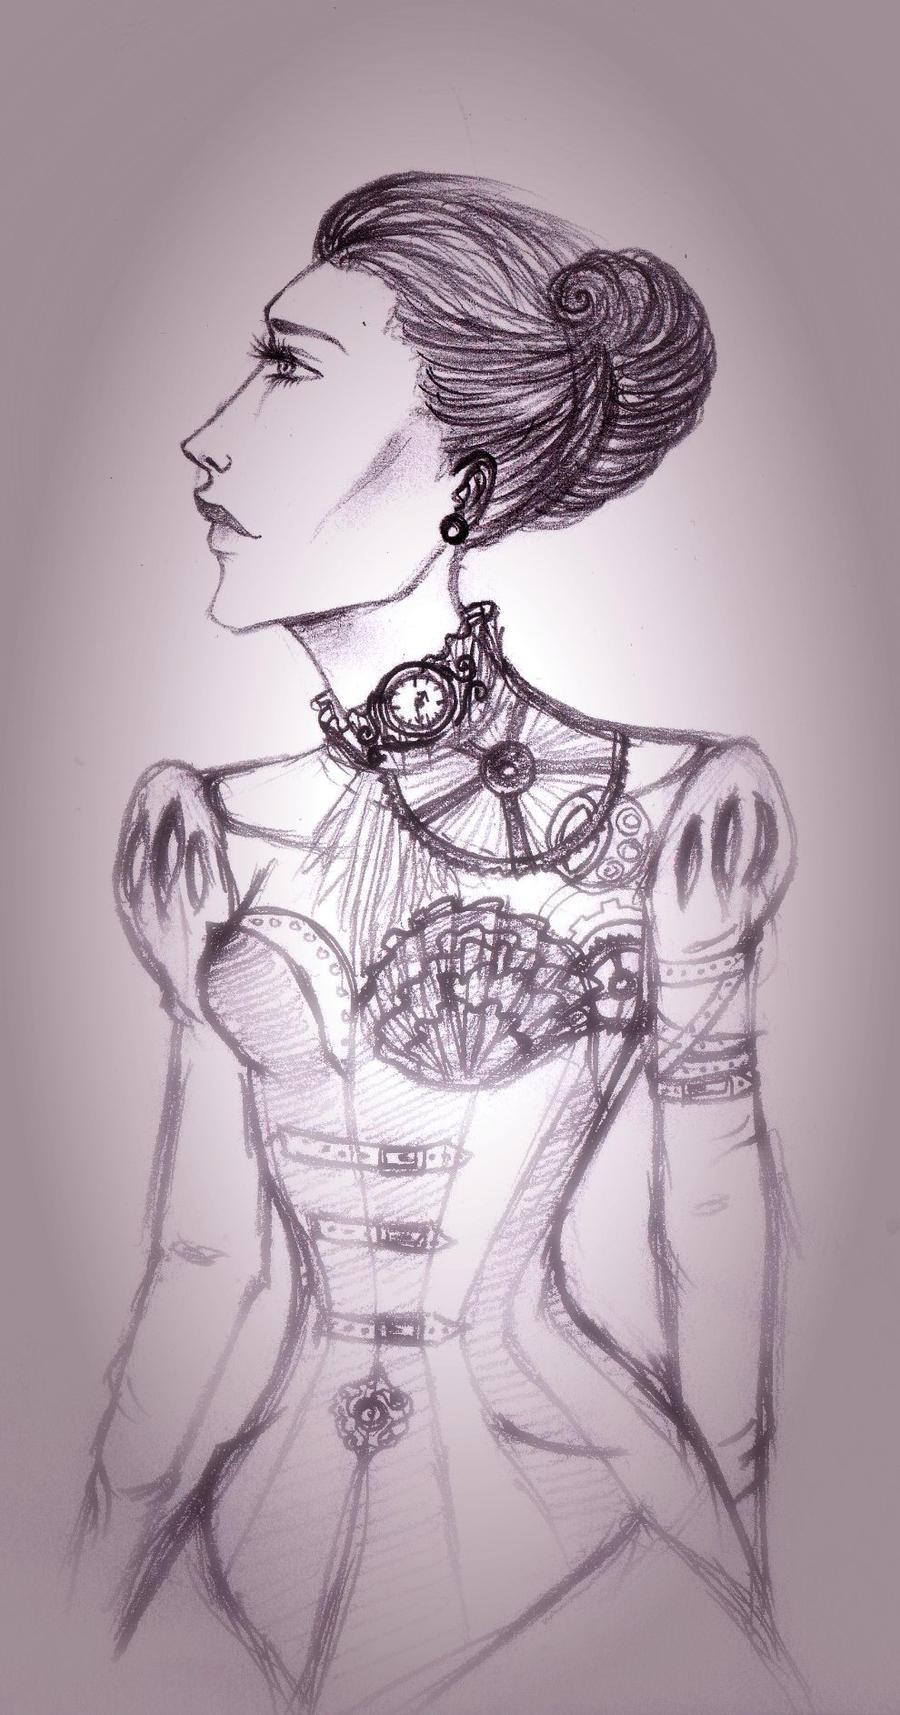 Steampunk Fashion Steampunk Fashion Sketch 5